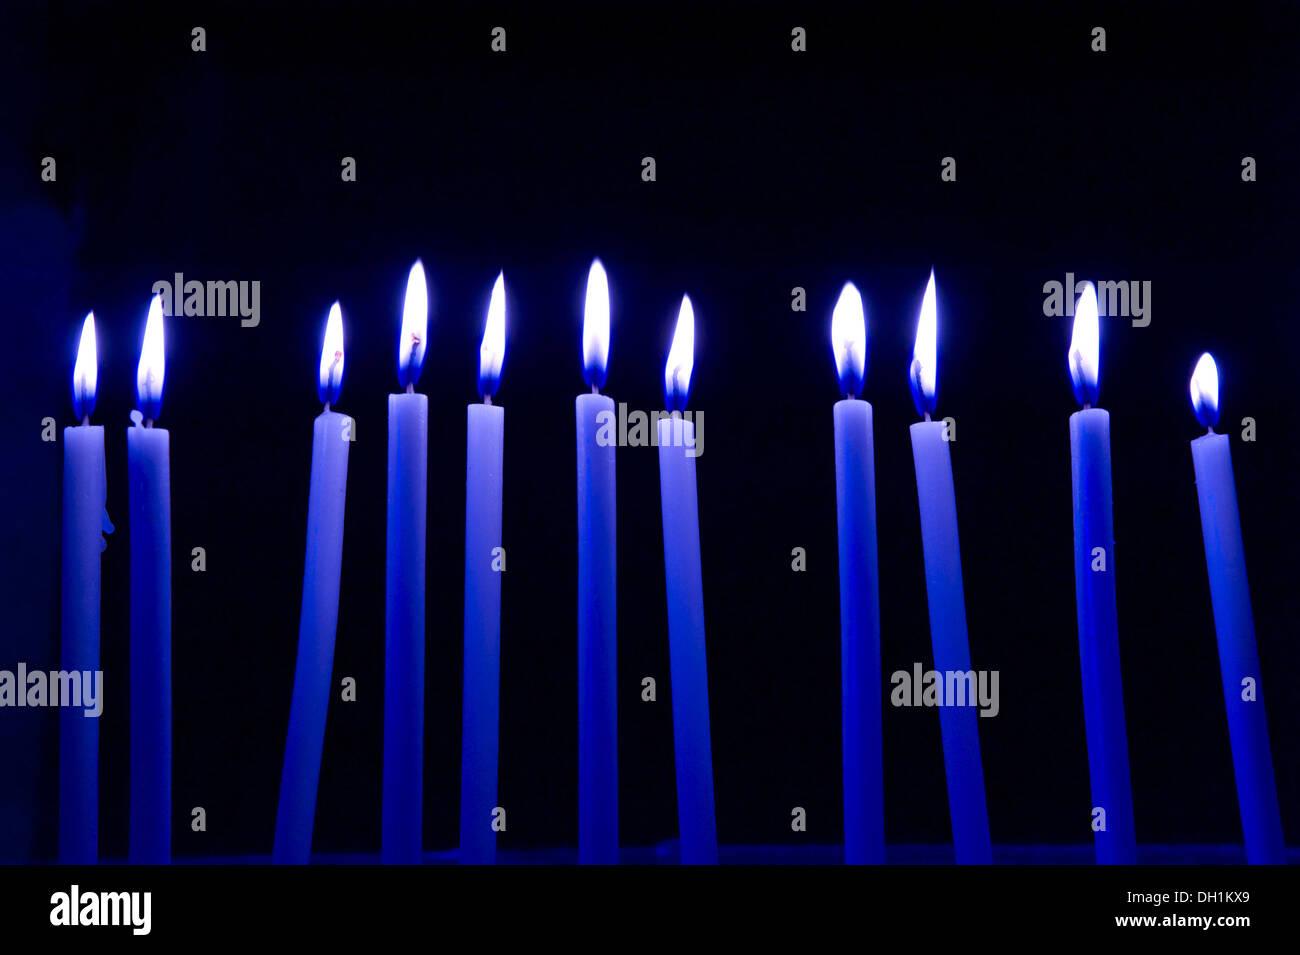 eleven blue candles burning flame black background - Stock Image